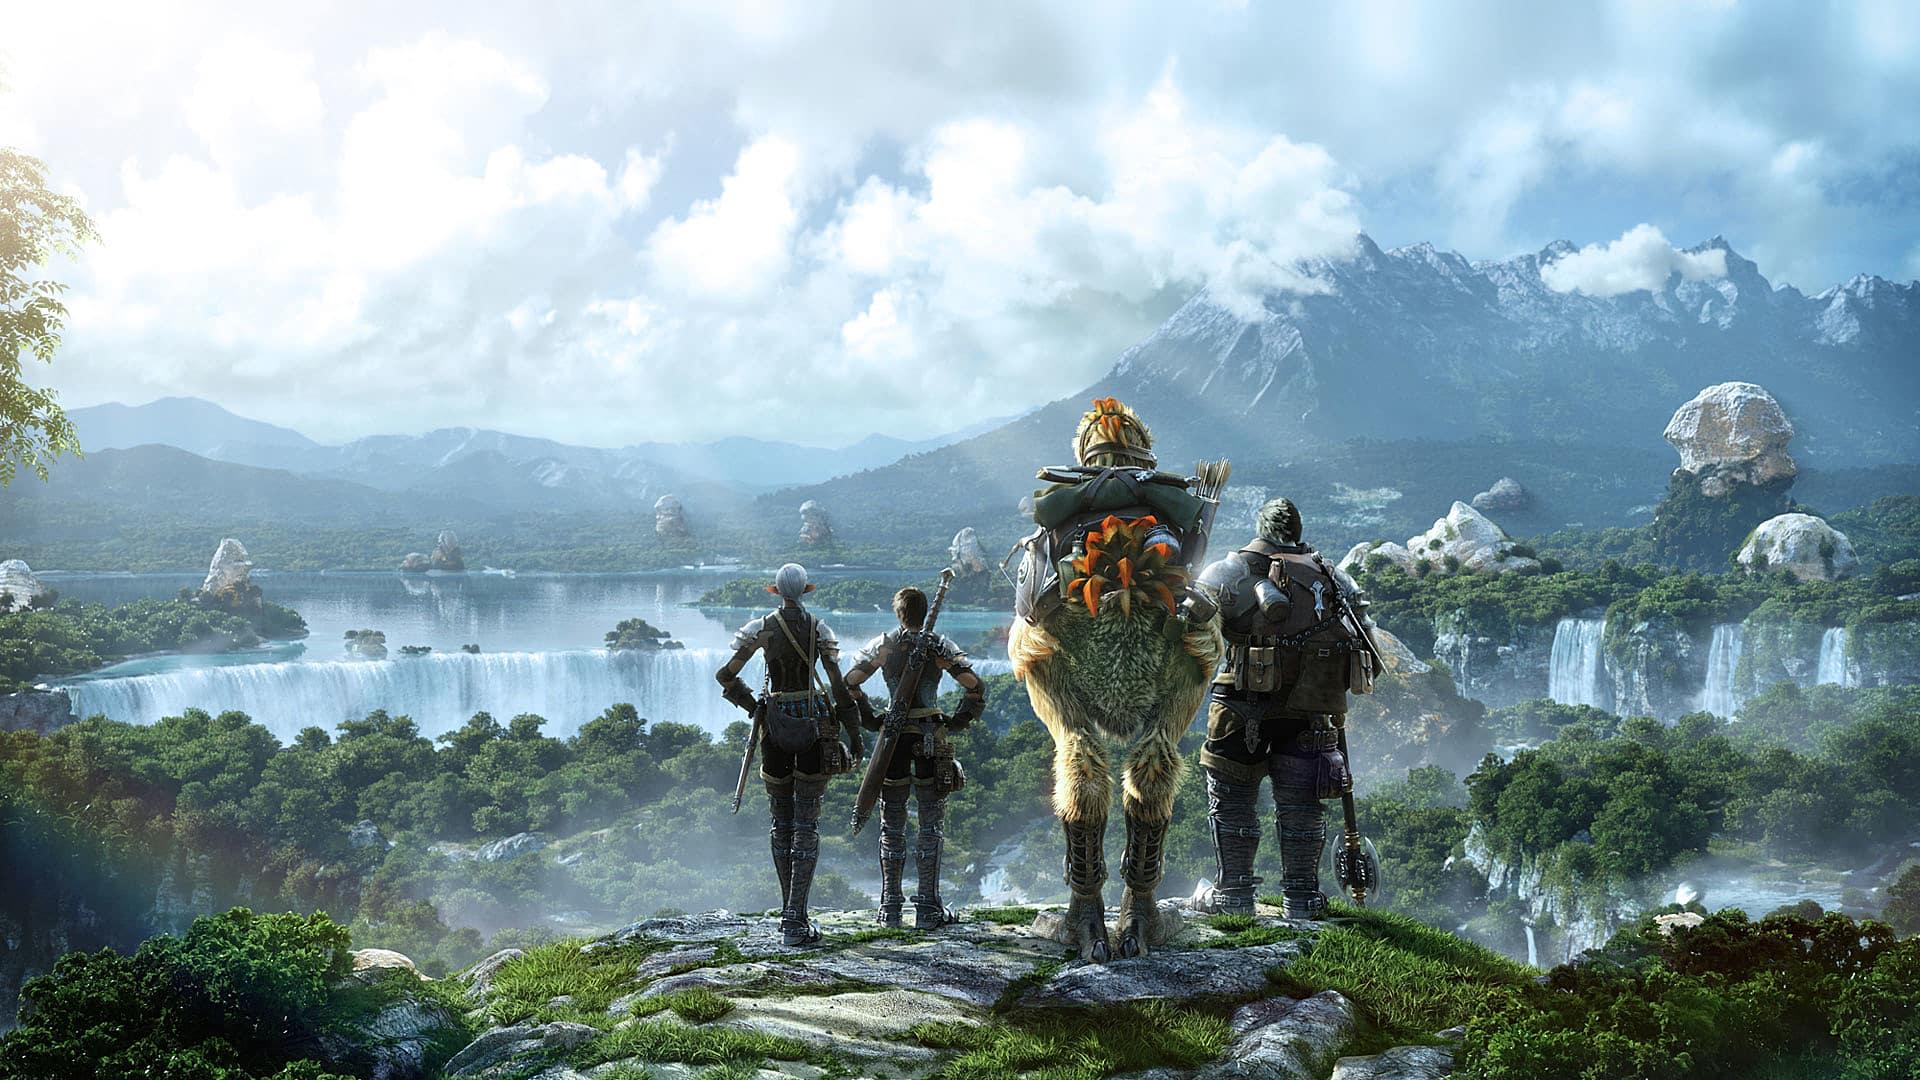 Interview: Final Fantasy 14's Naoki Yoshida on Shadowbringers, Xbox and rebuilding A Realm Reborn